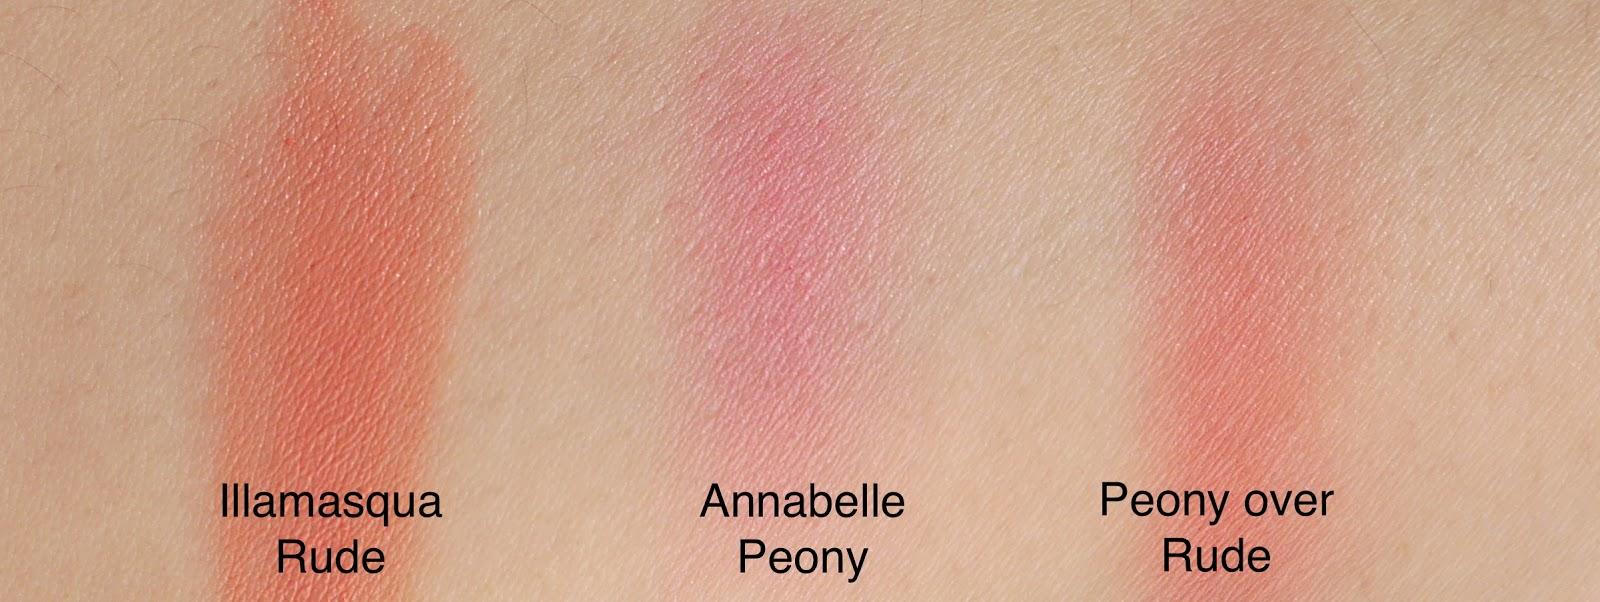 illamasqua rude cream blush and annabelle peony blush swatch layered